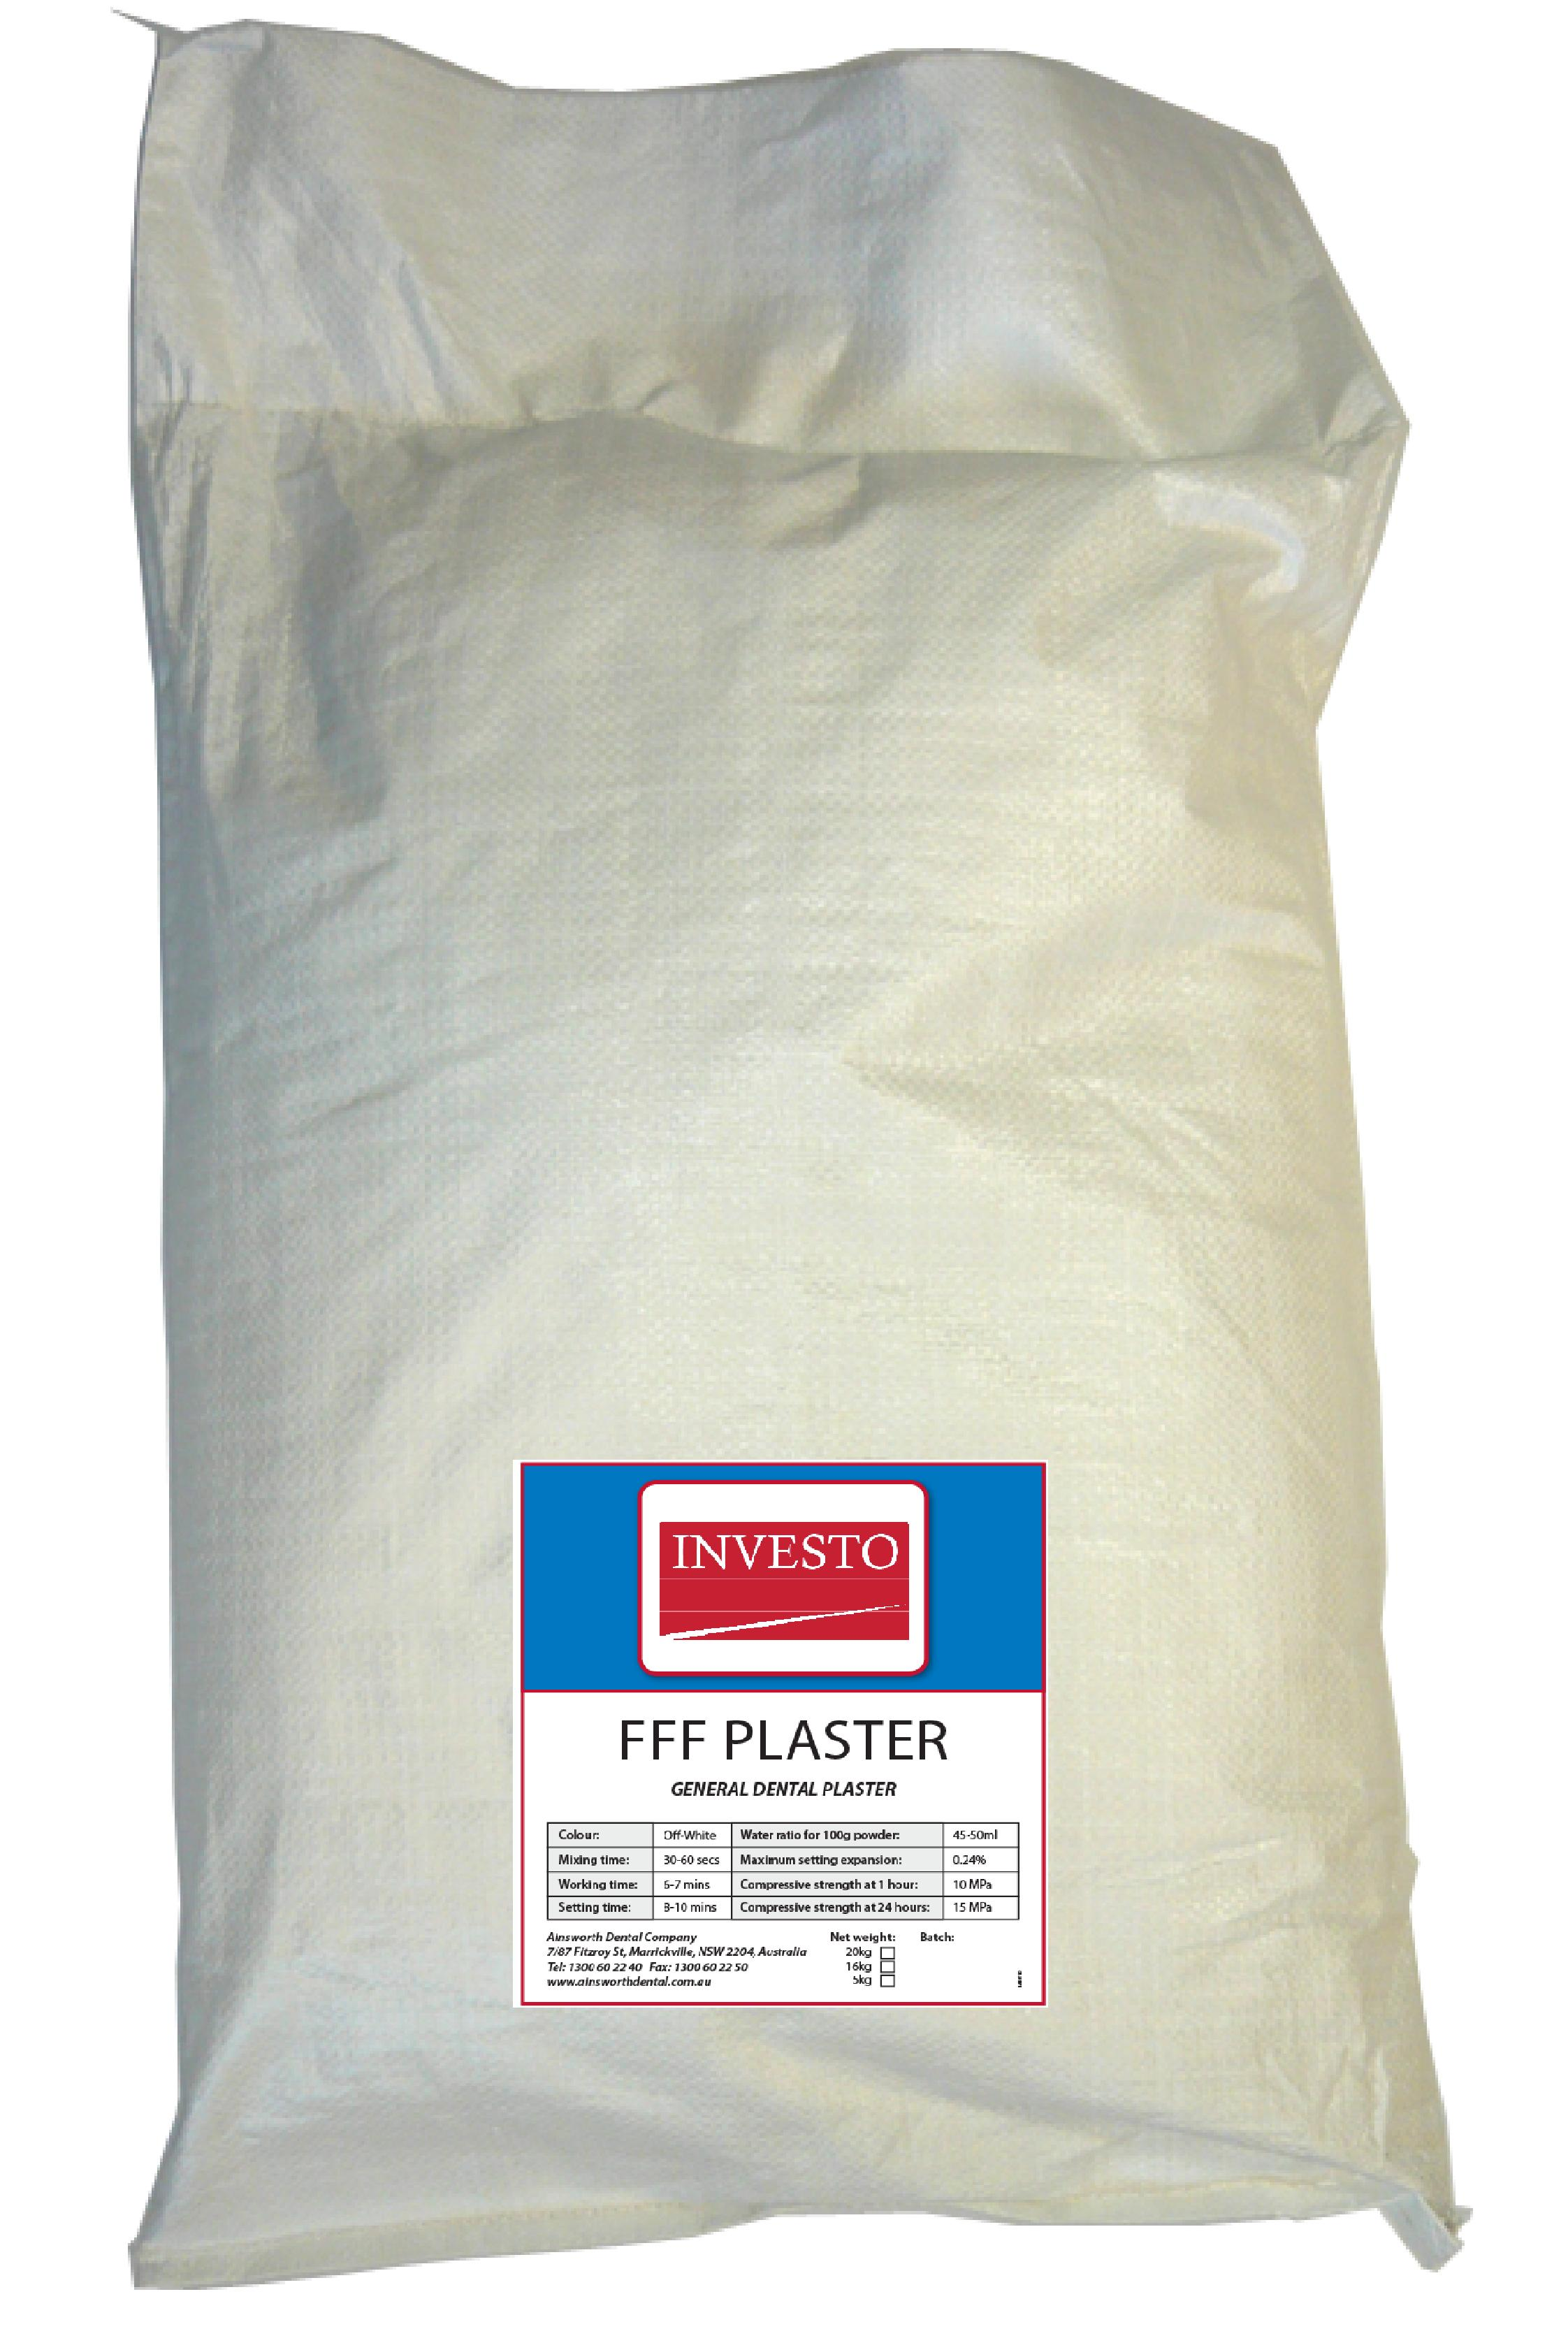 Investo FFF Plaster 20kg Bag